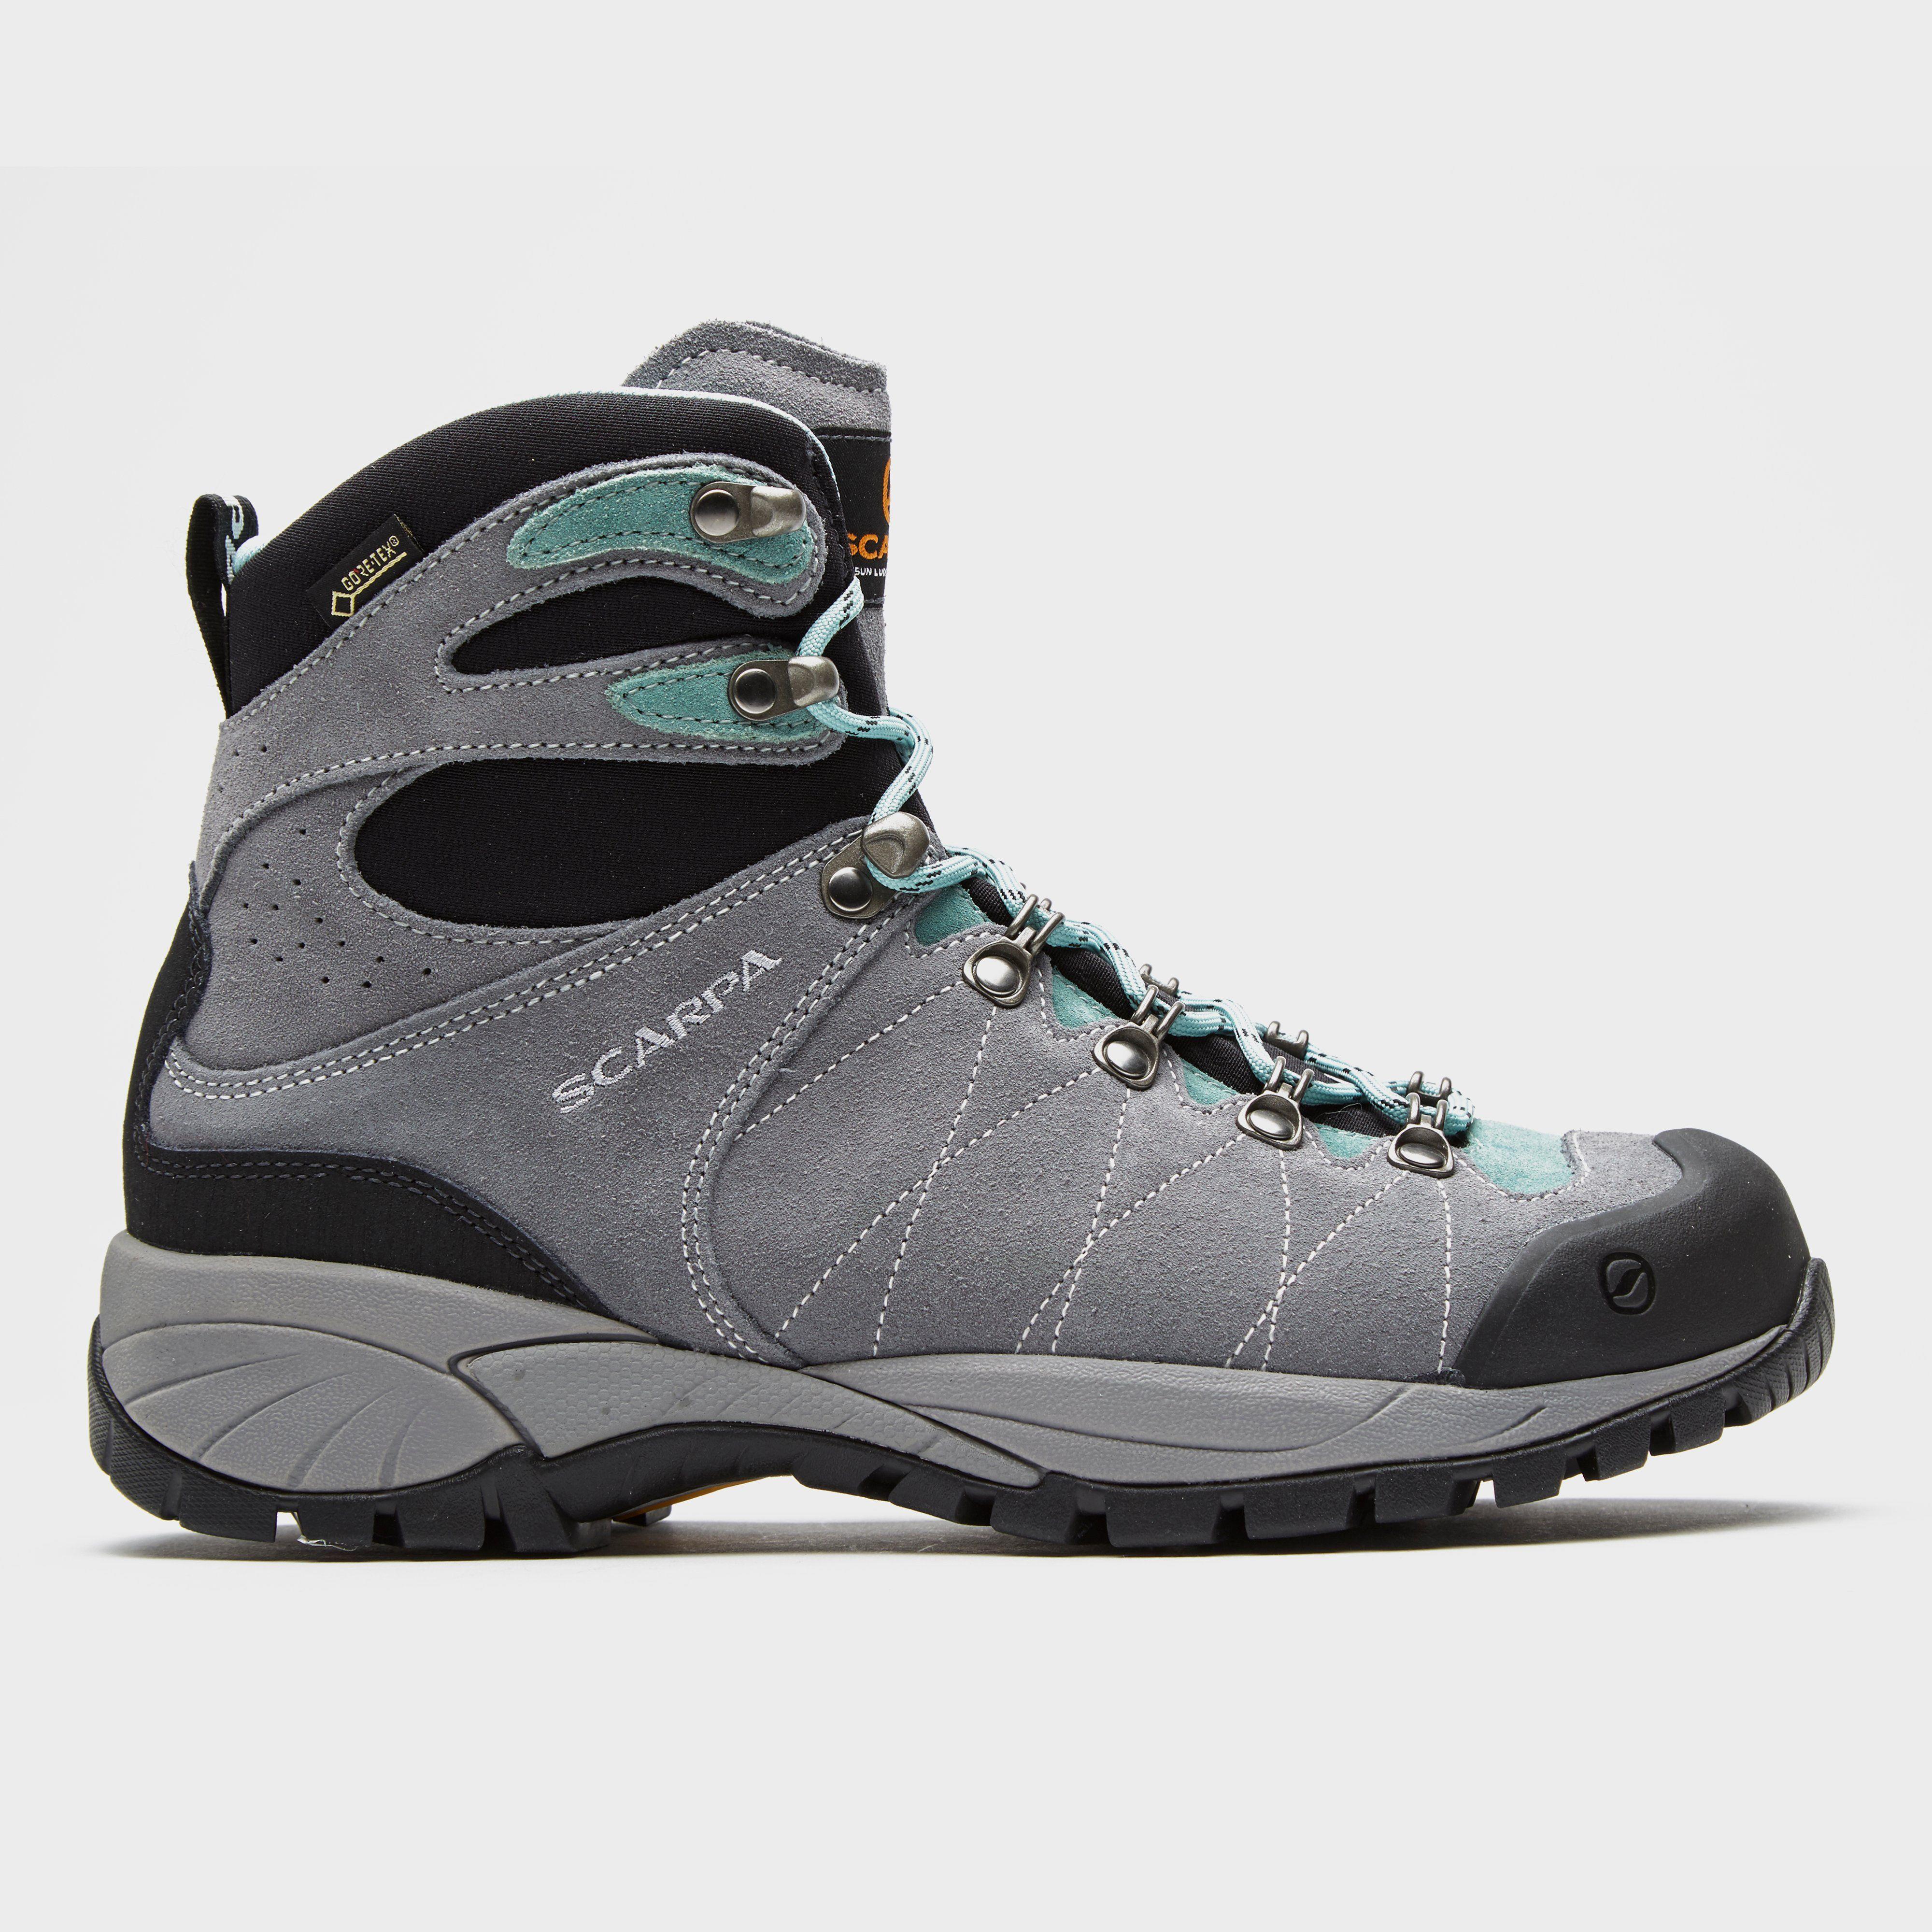 SCARPA Women's R-Evo GORE-TEX® Hiking Boot